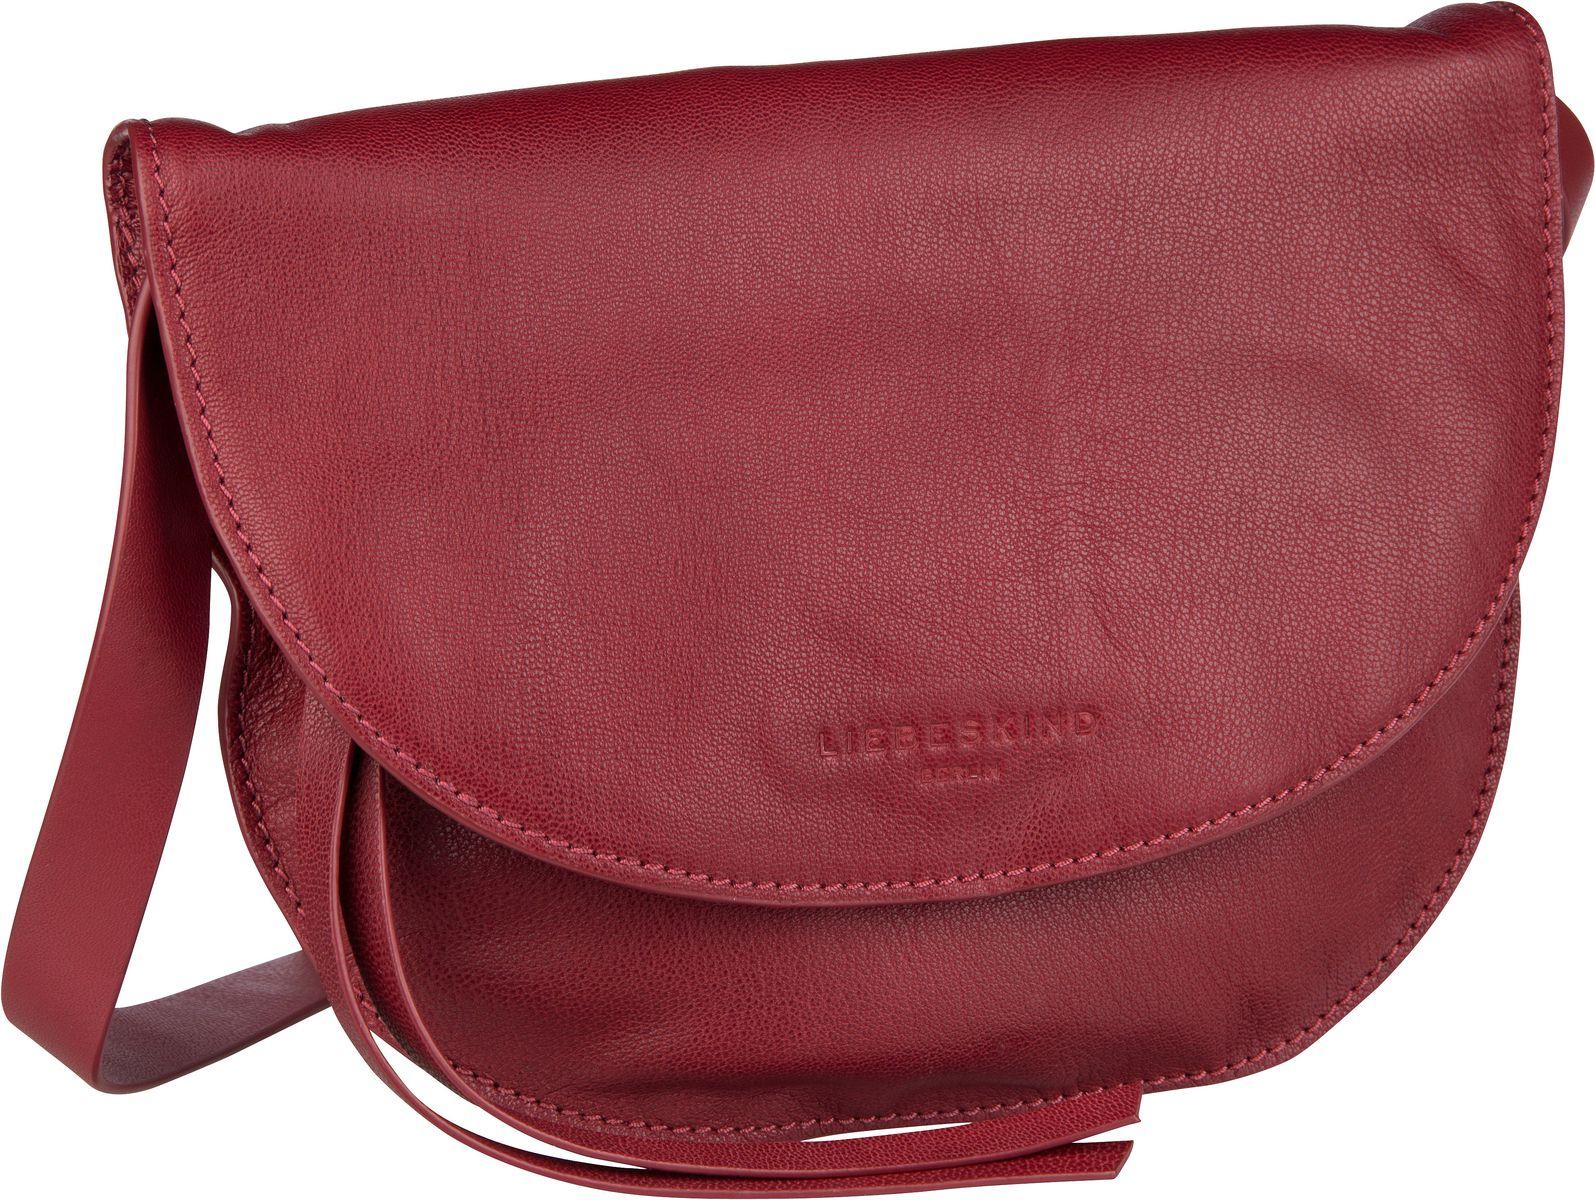 Berlin Umhängetasche Dive Bag 2 Clutch S Dahlia Red